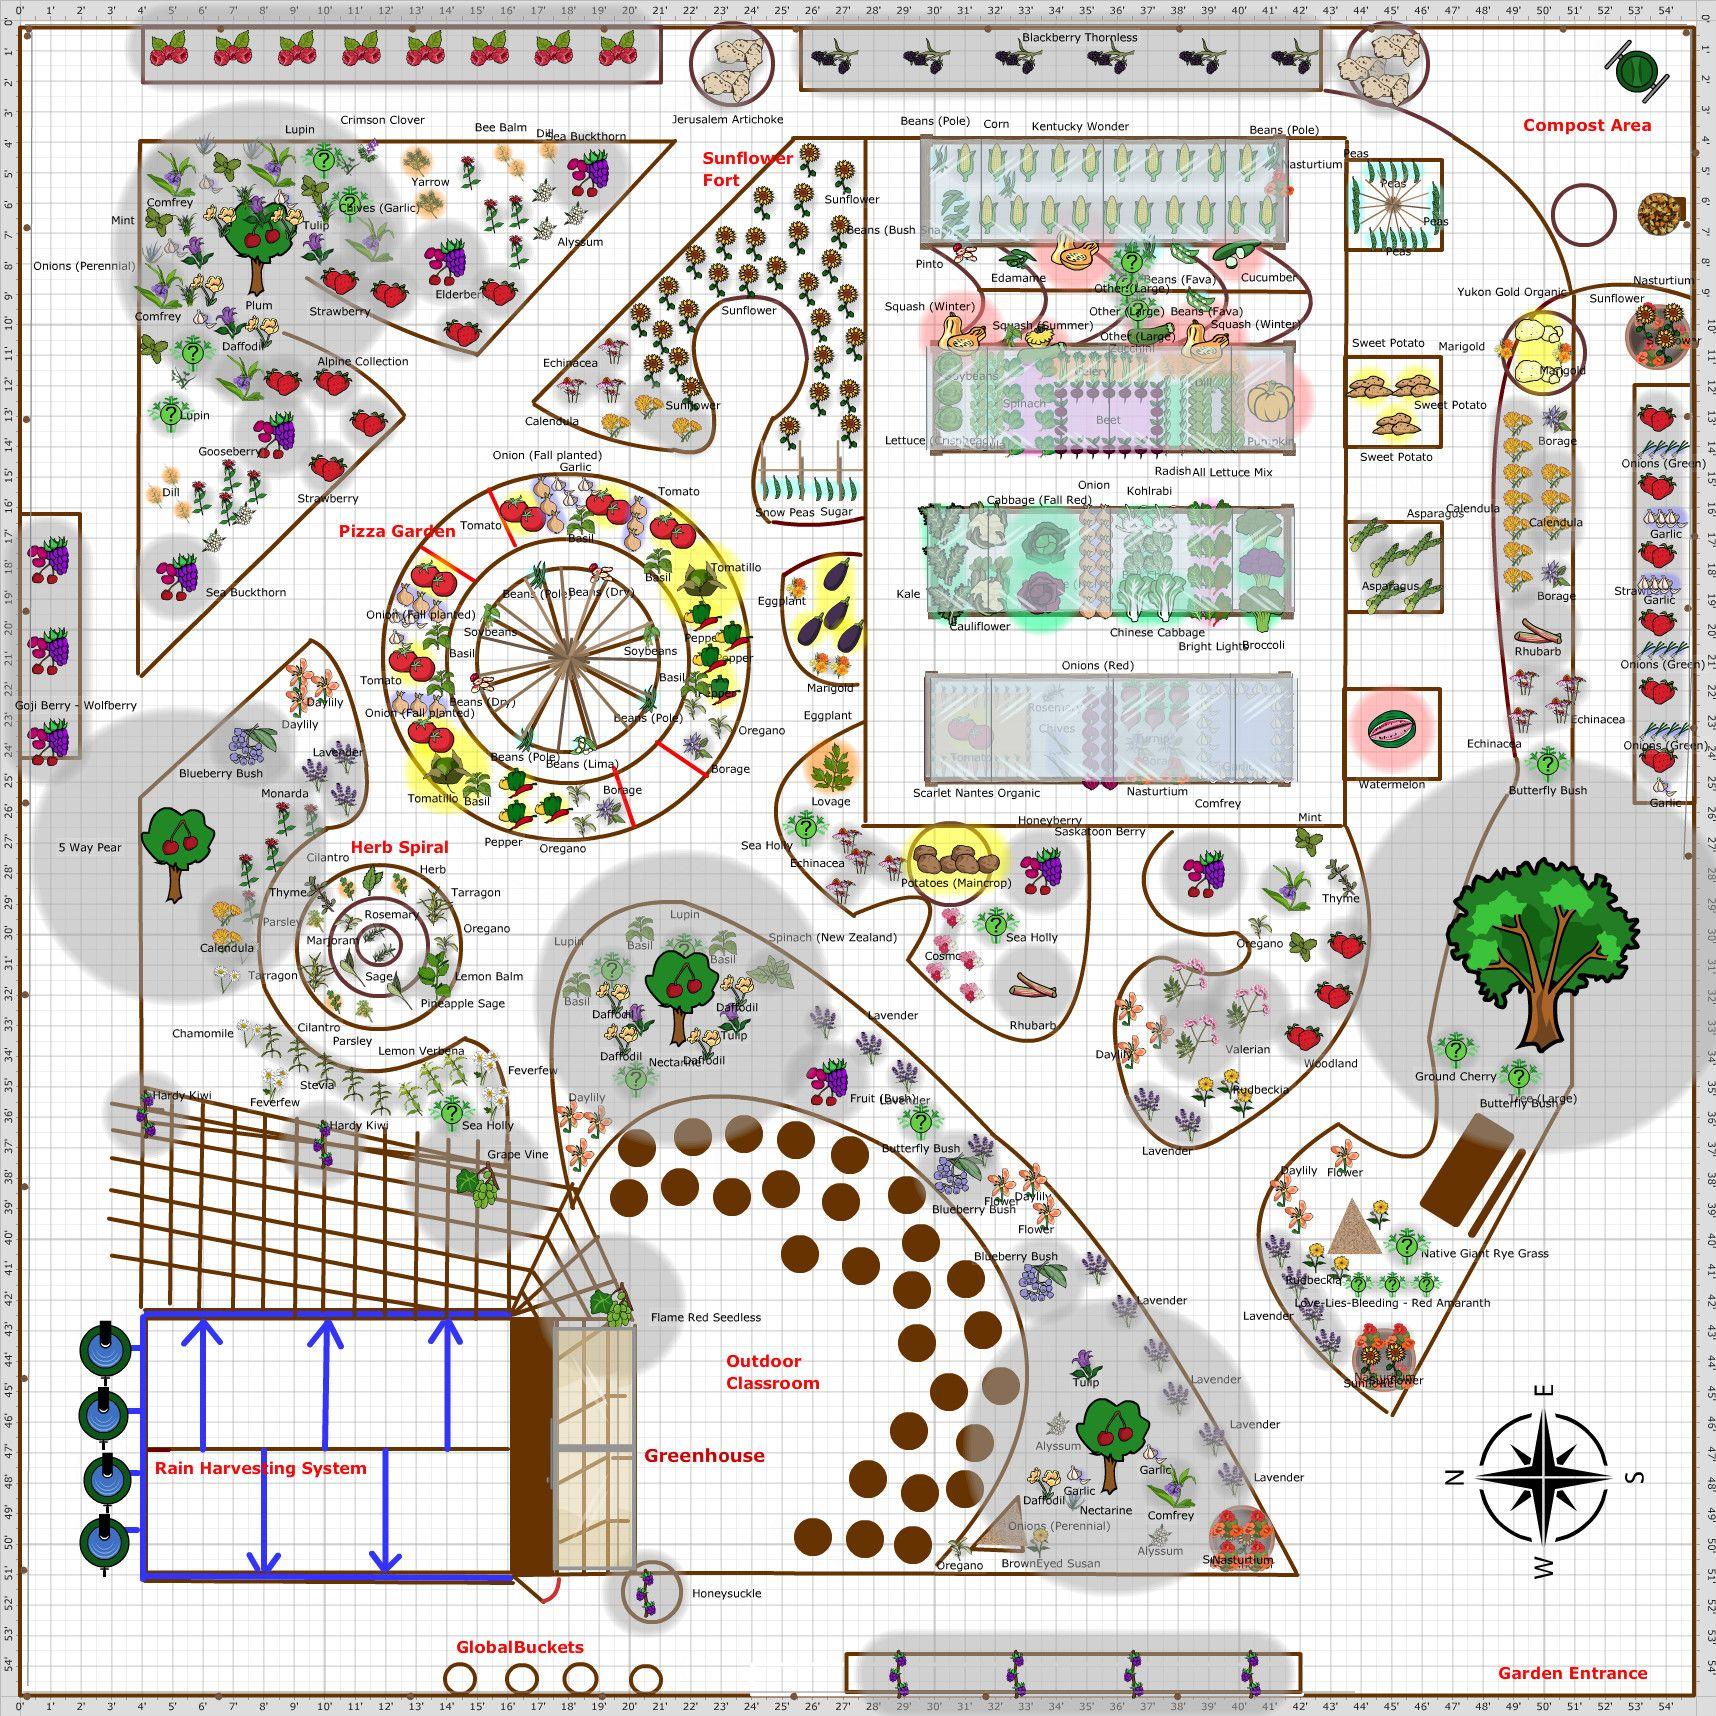 Garden Plan Jardin Enchante de Beairsto This is the design that